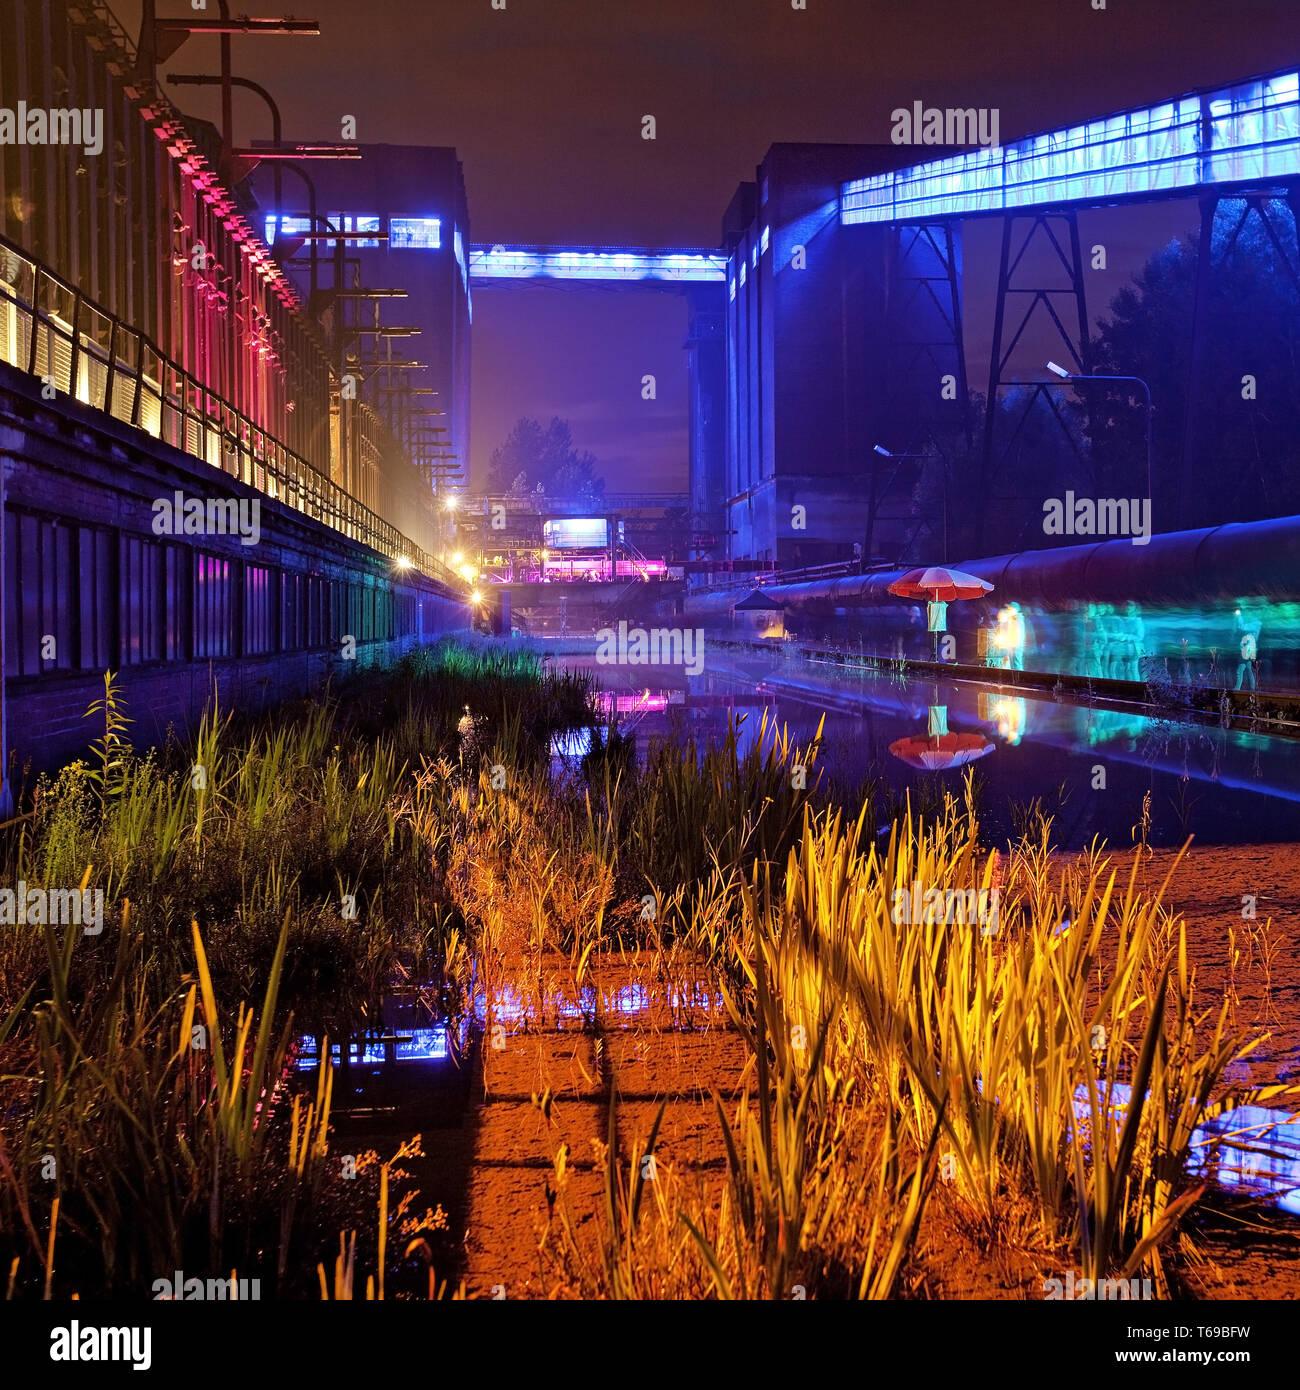 illuminated coking plant Hansa at Extraschicht, Dortmund, Ruhr Area, Germany - Stock Image